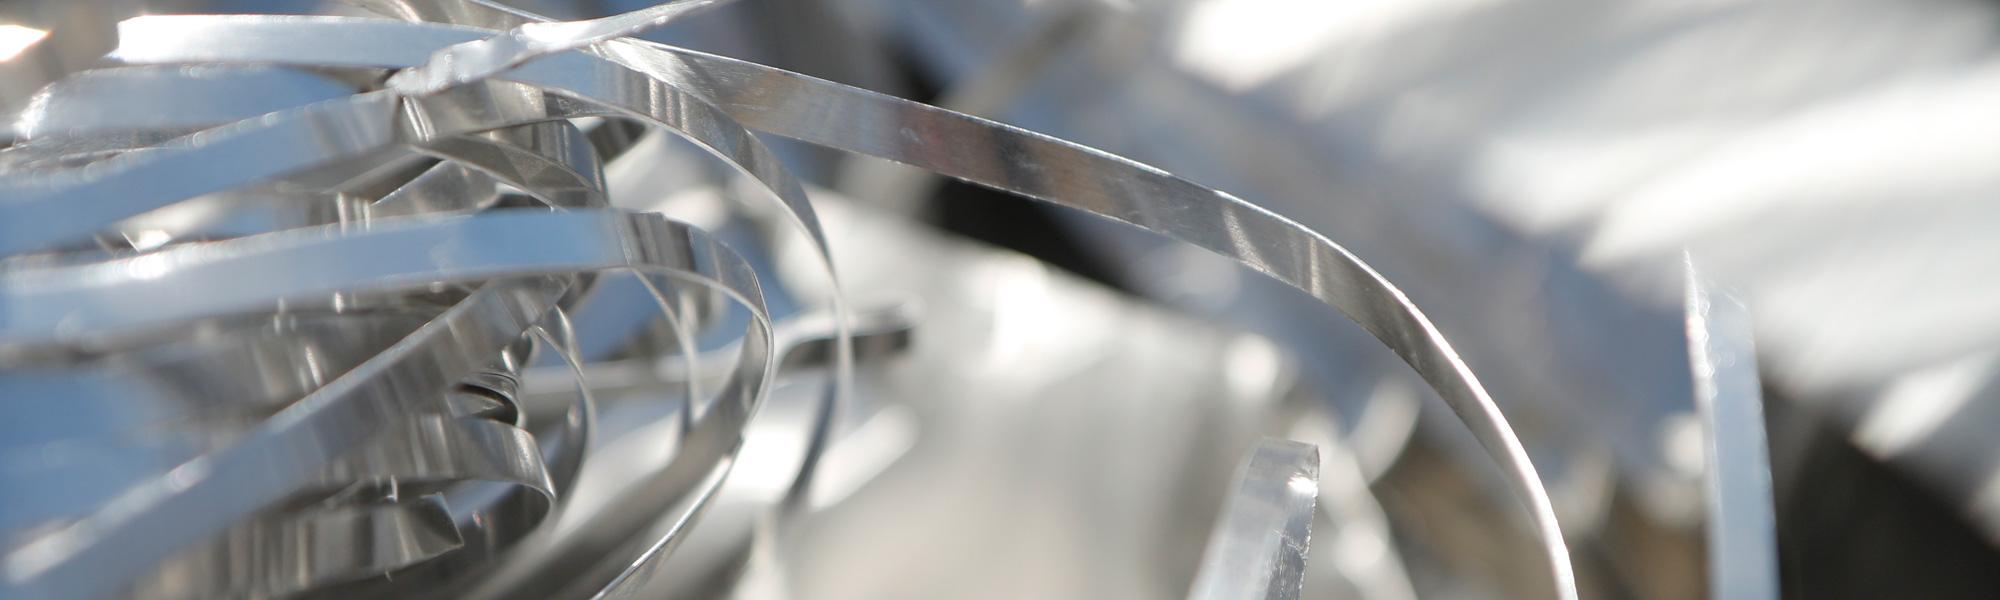 Götz GmbH Schrott + Metalle CI-Bild